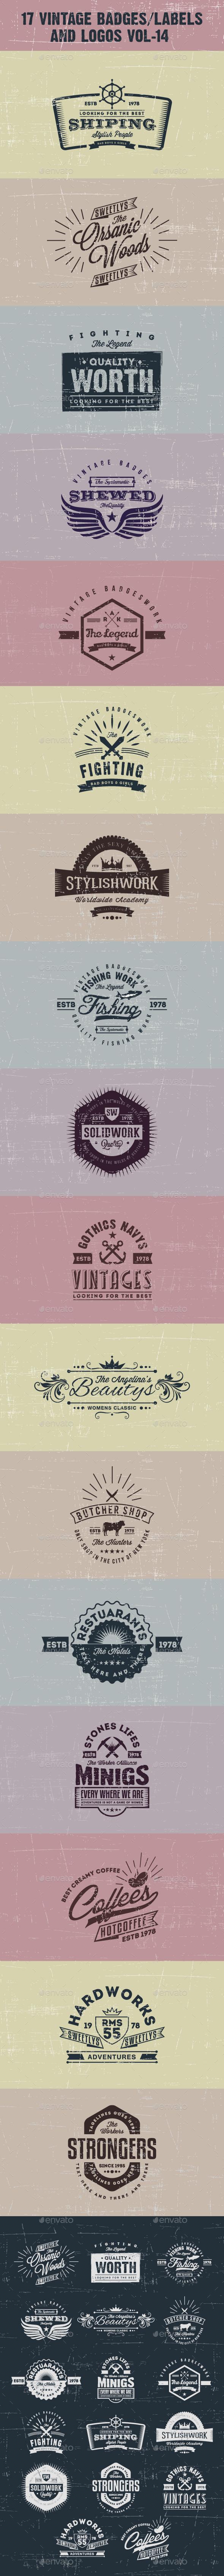 17 Vintage Badges/labels and Logos Vol-14 - Badges & Stickers Web Elements